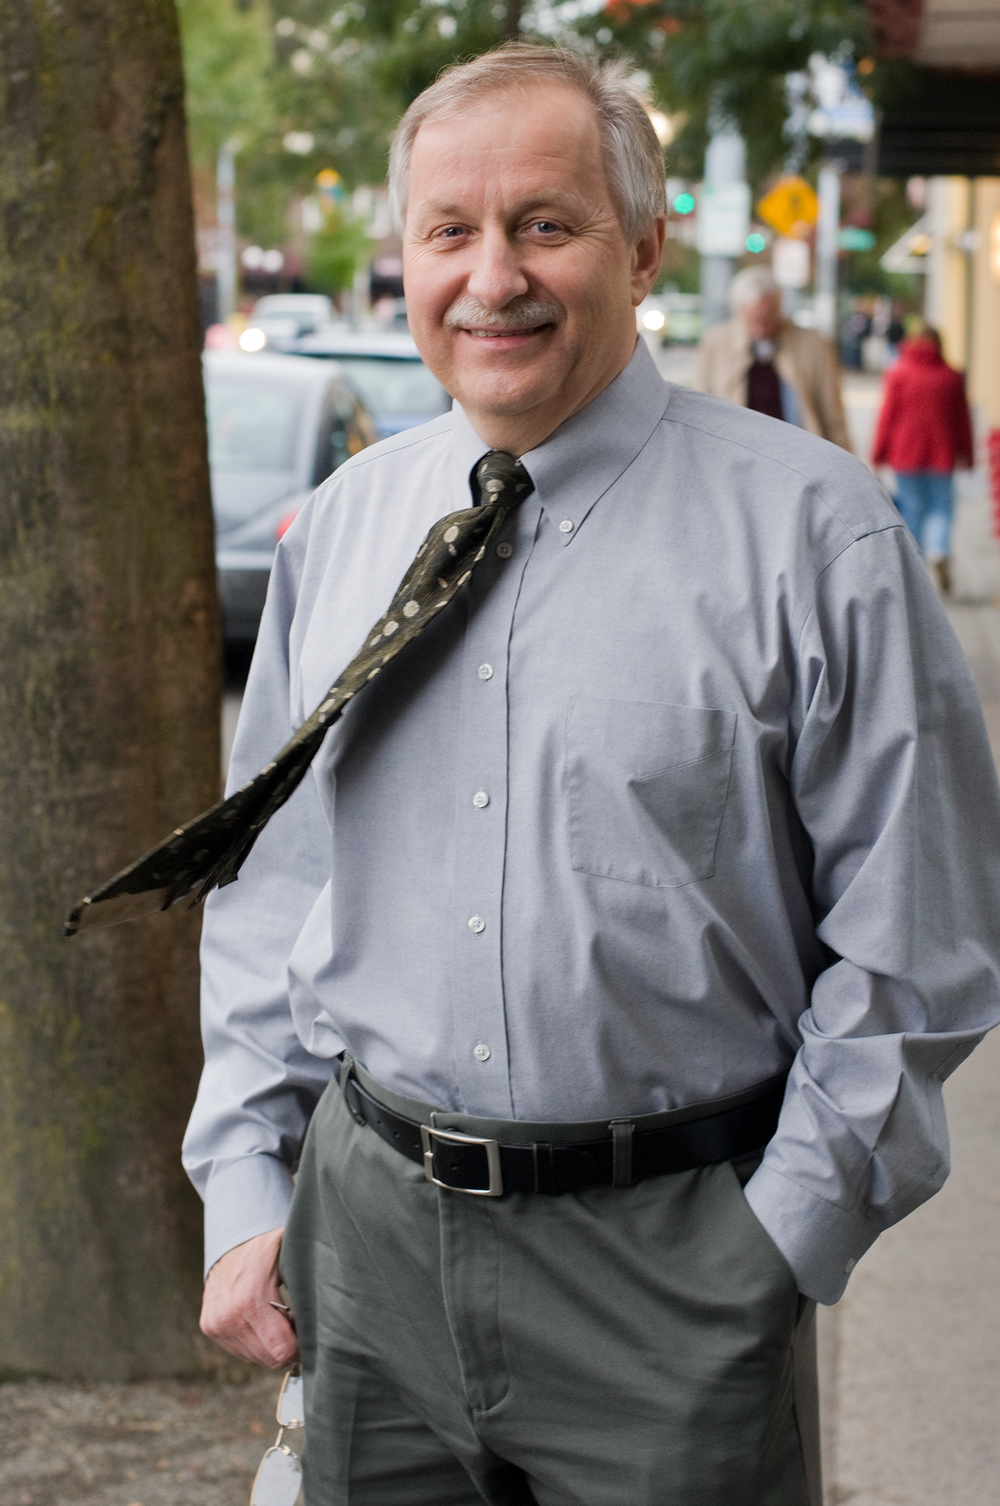 Washington State House Representative, Frank Chopp